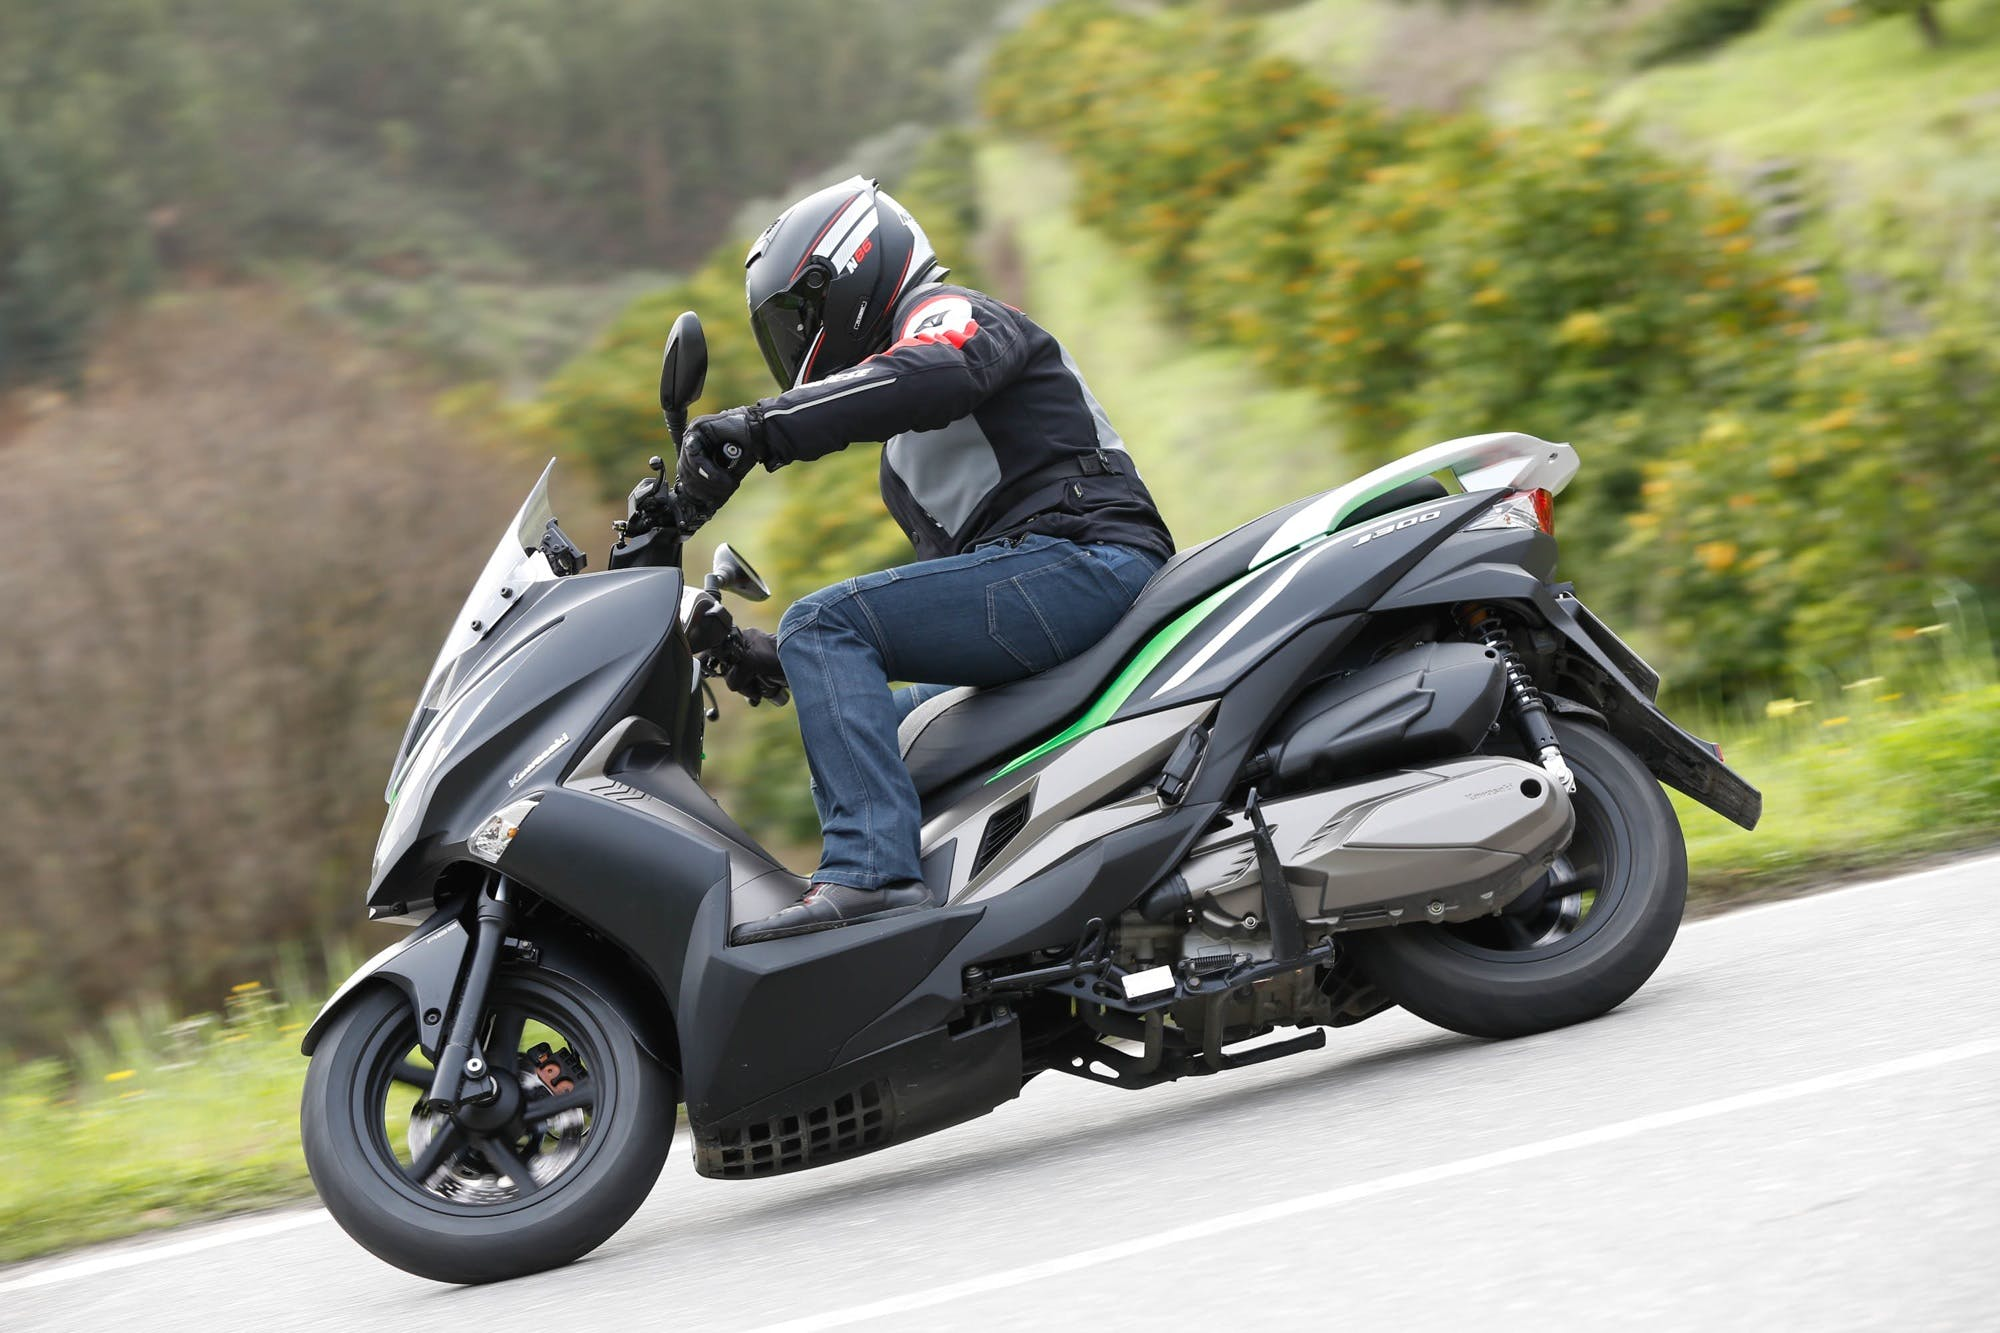 Kawasaki J 300 Migliori scooter 300